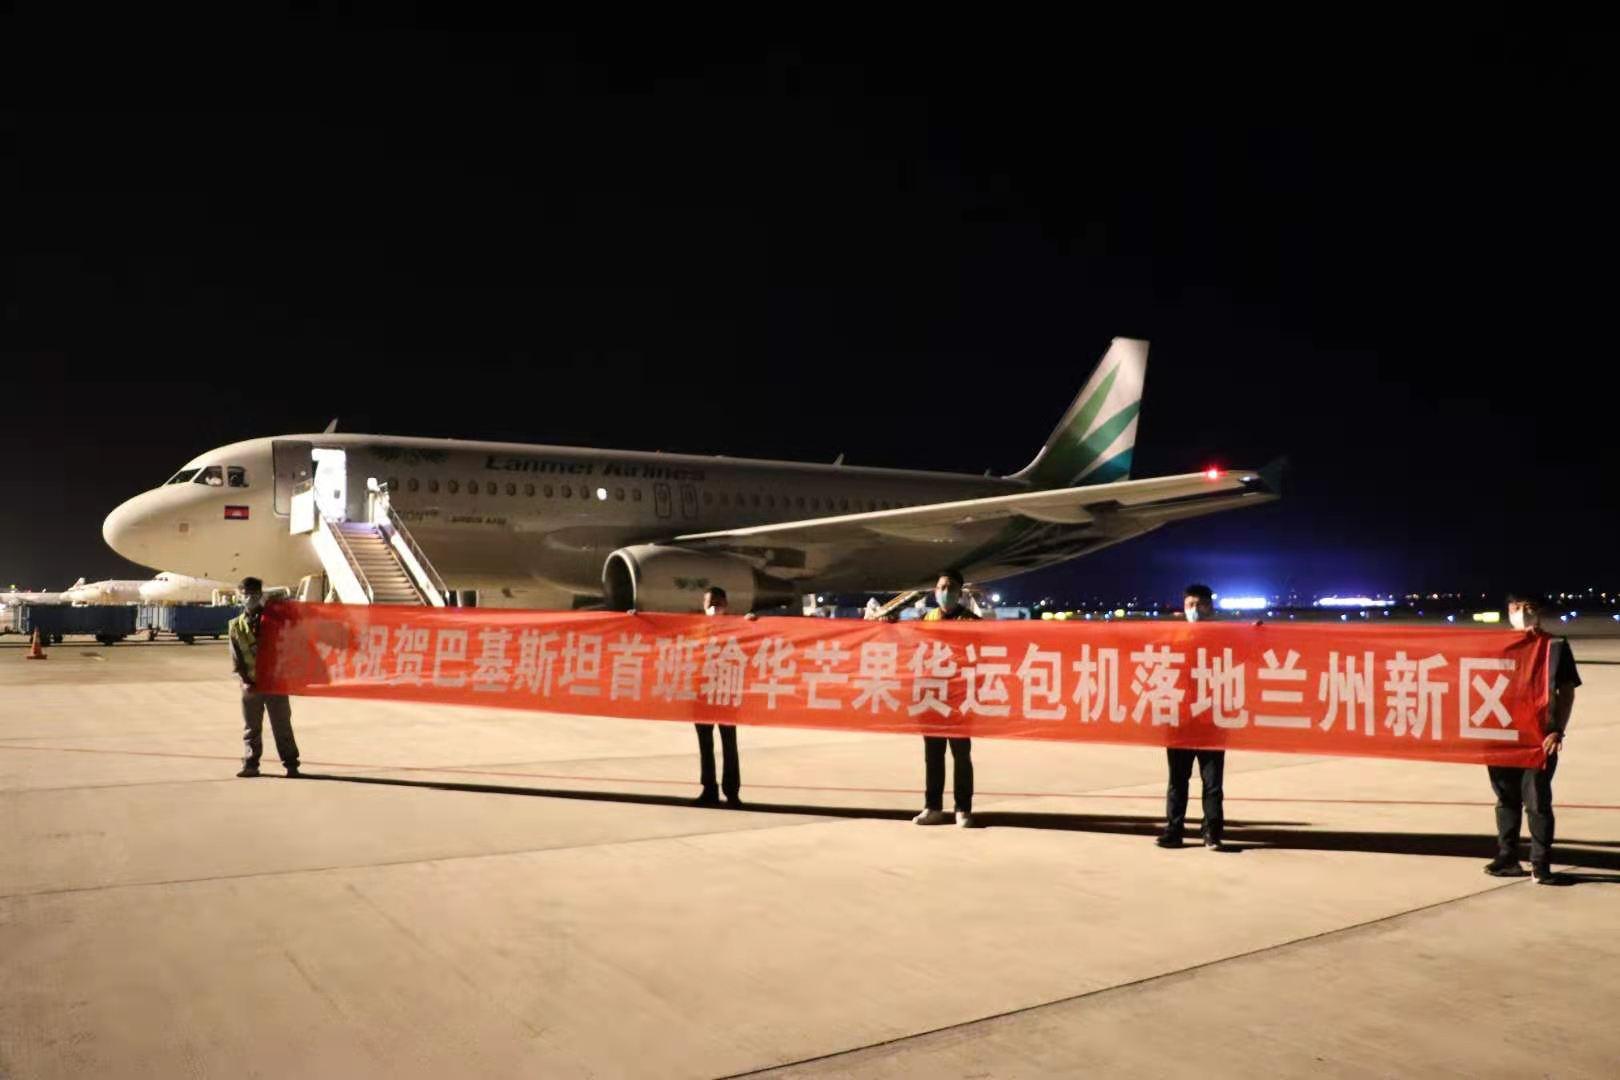 First full plane of Pakistani Mangoes lands in Lanzhou